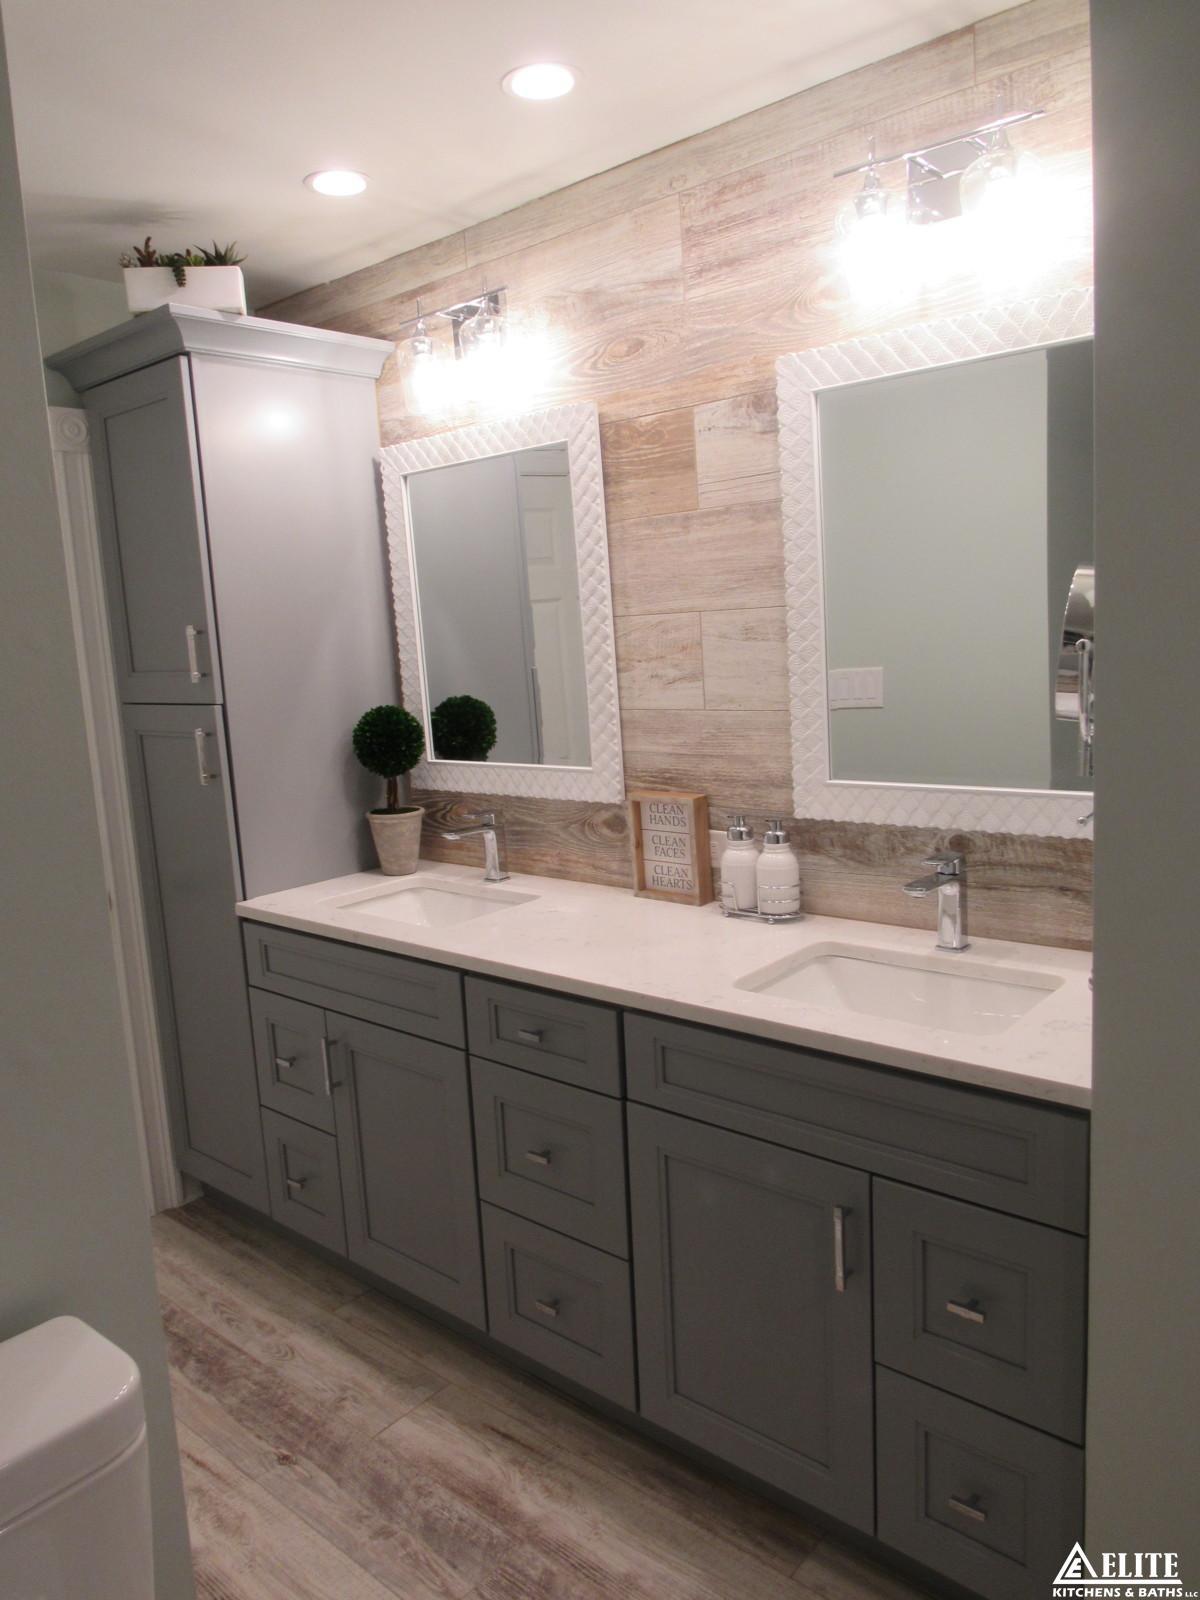 Bathrooms 103